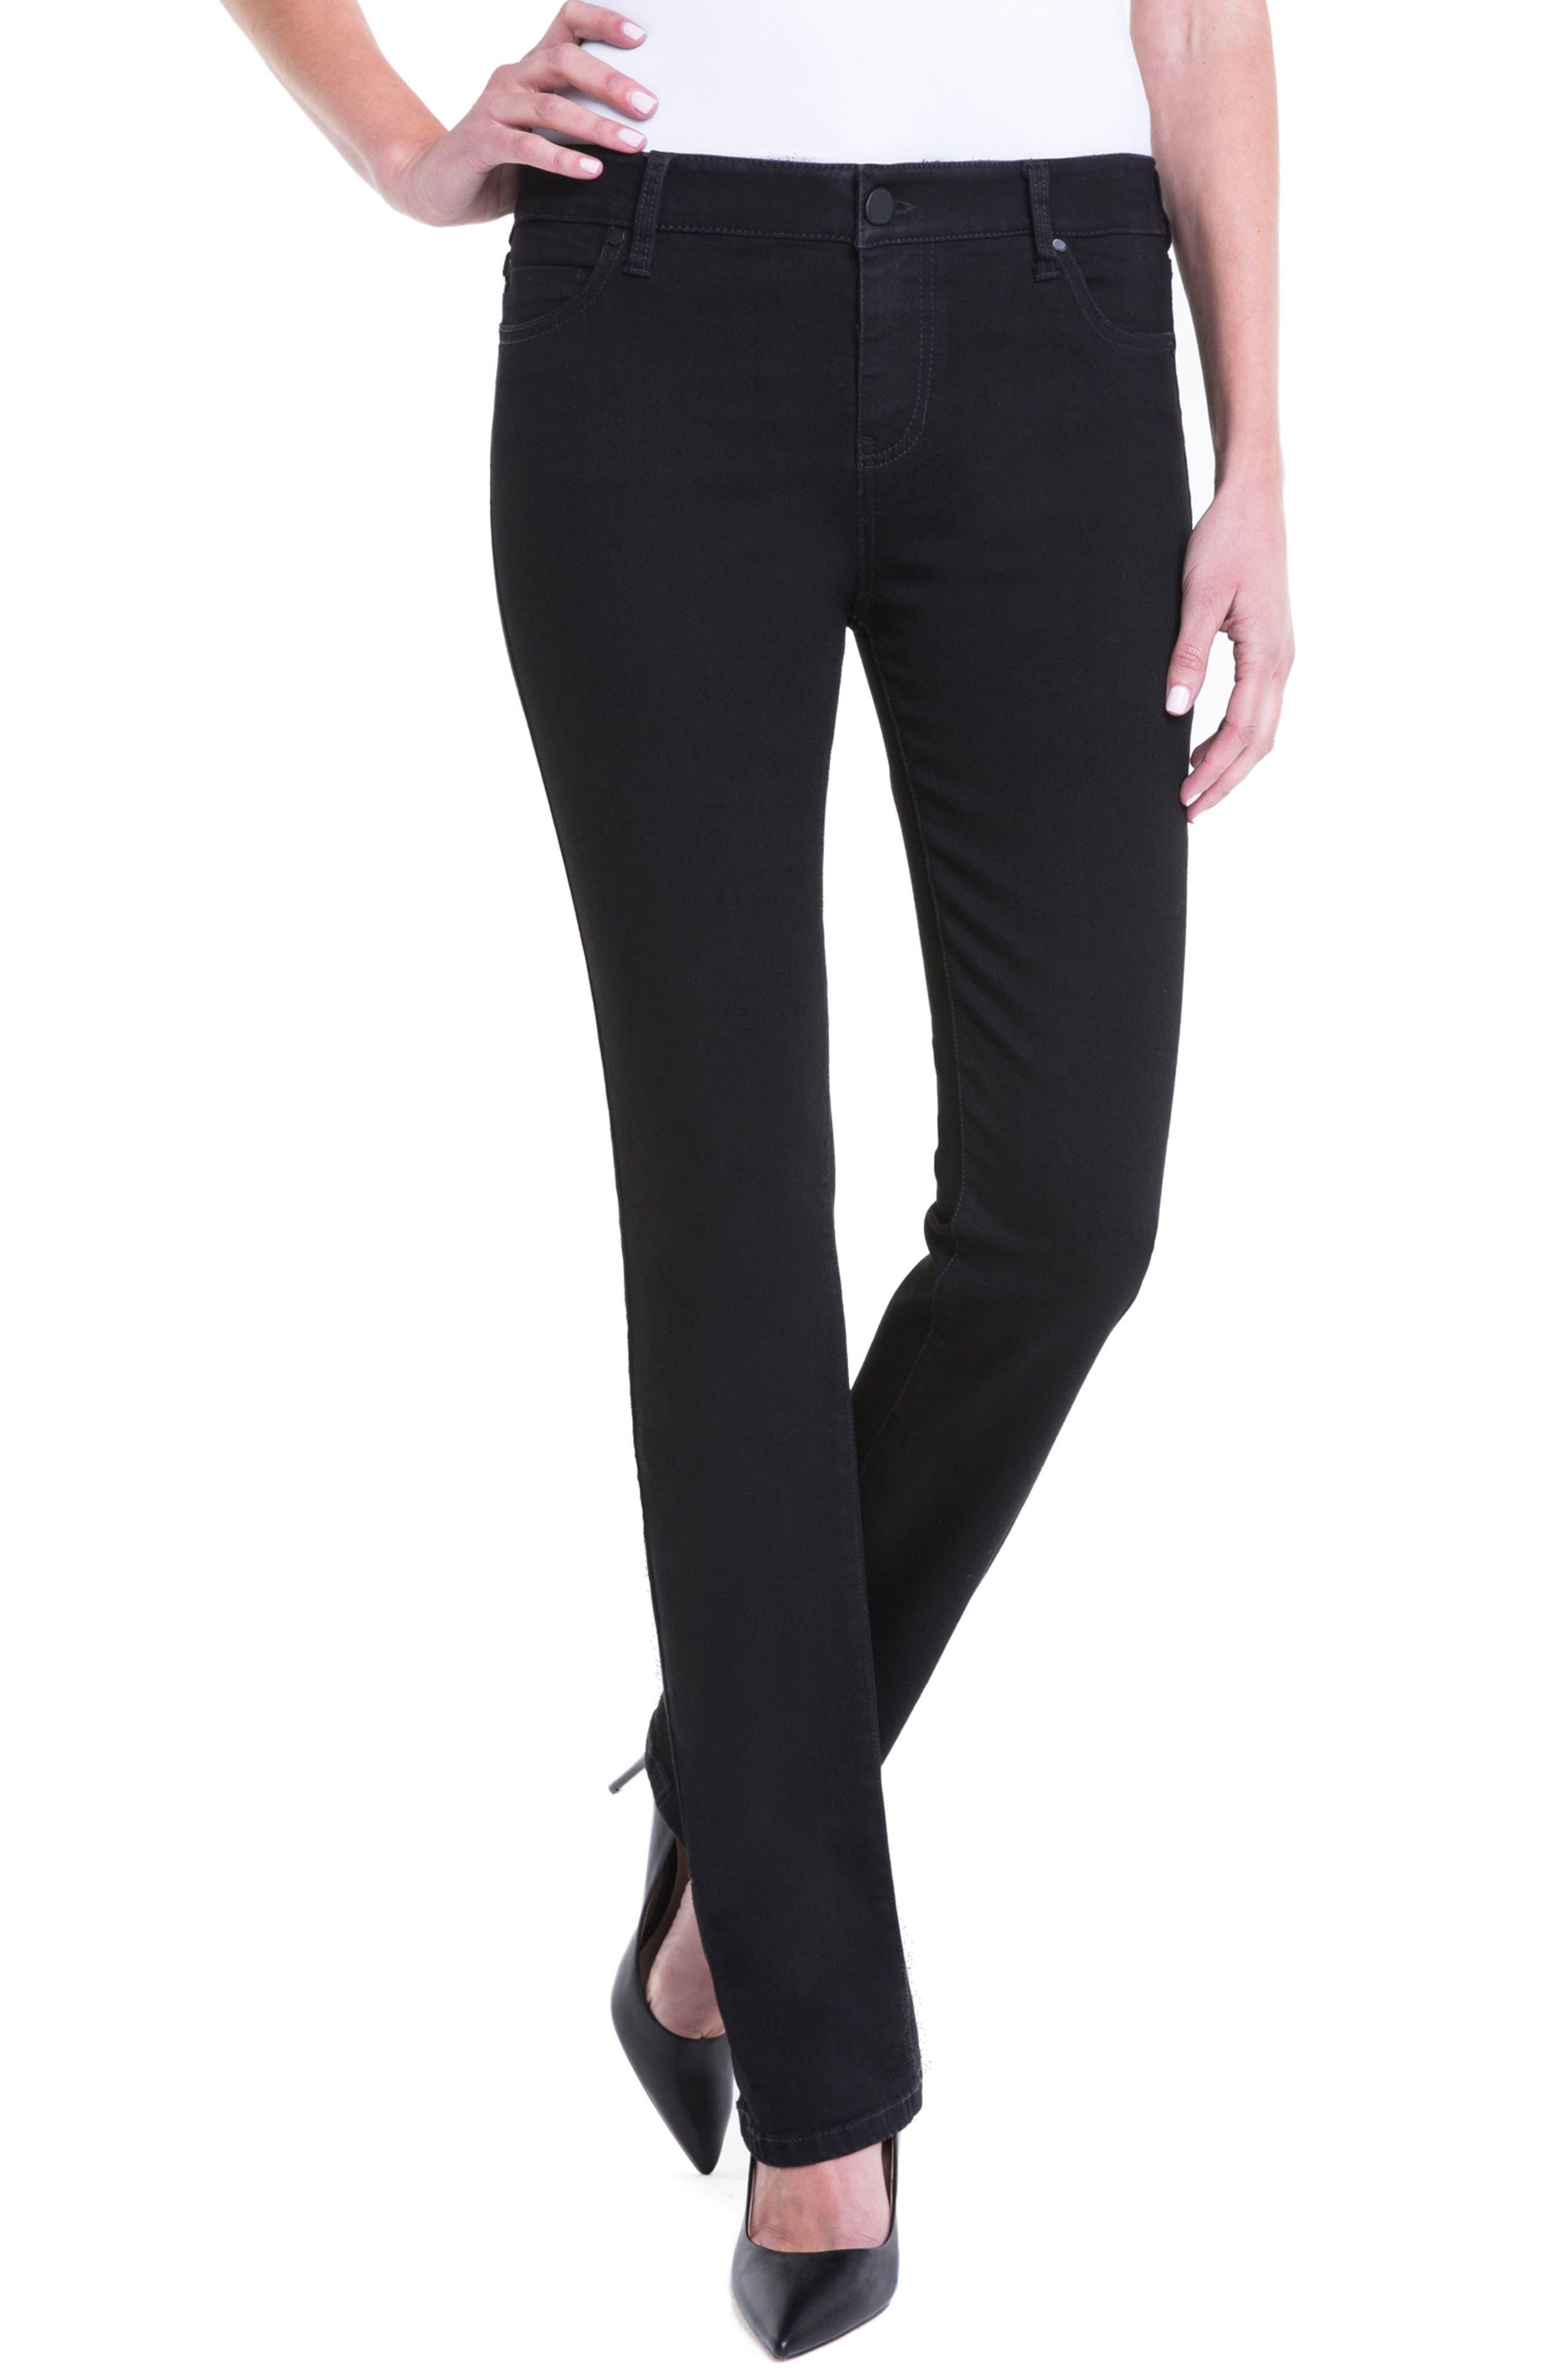 Main Image - Liverpool Jeans Company Sadie Mid Rise Stretch Straight Jeans (Black Rinse) (Regular & Petite)